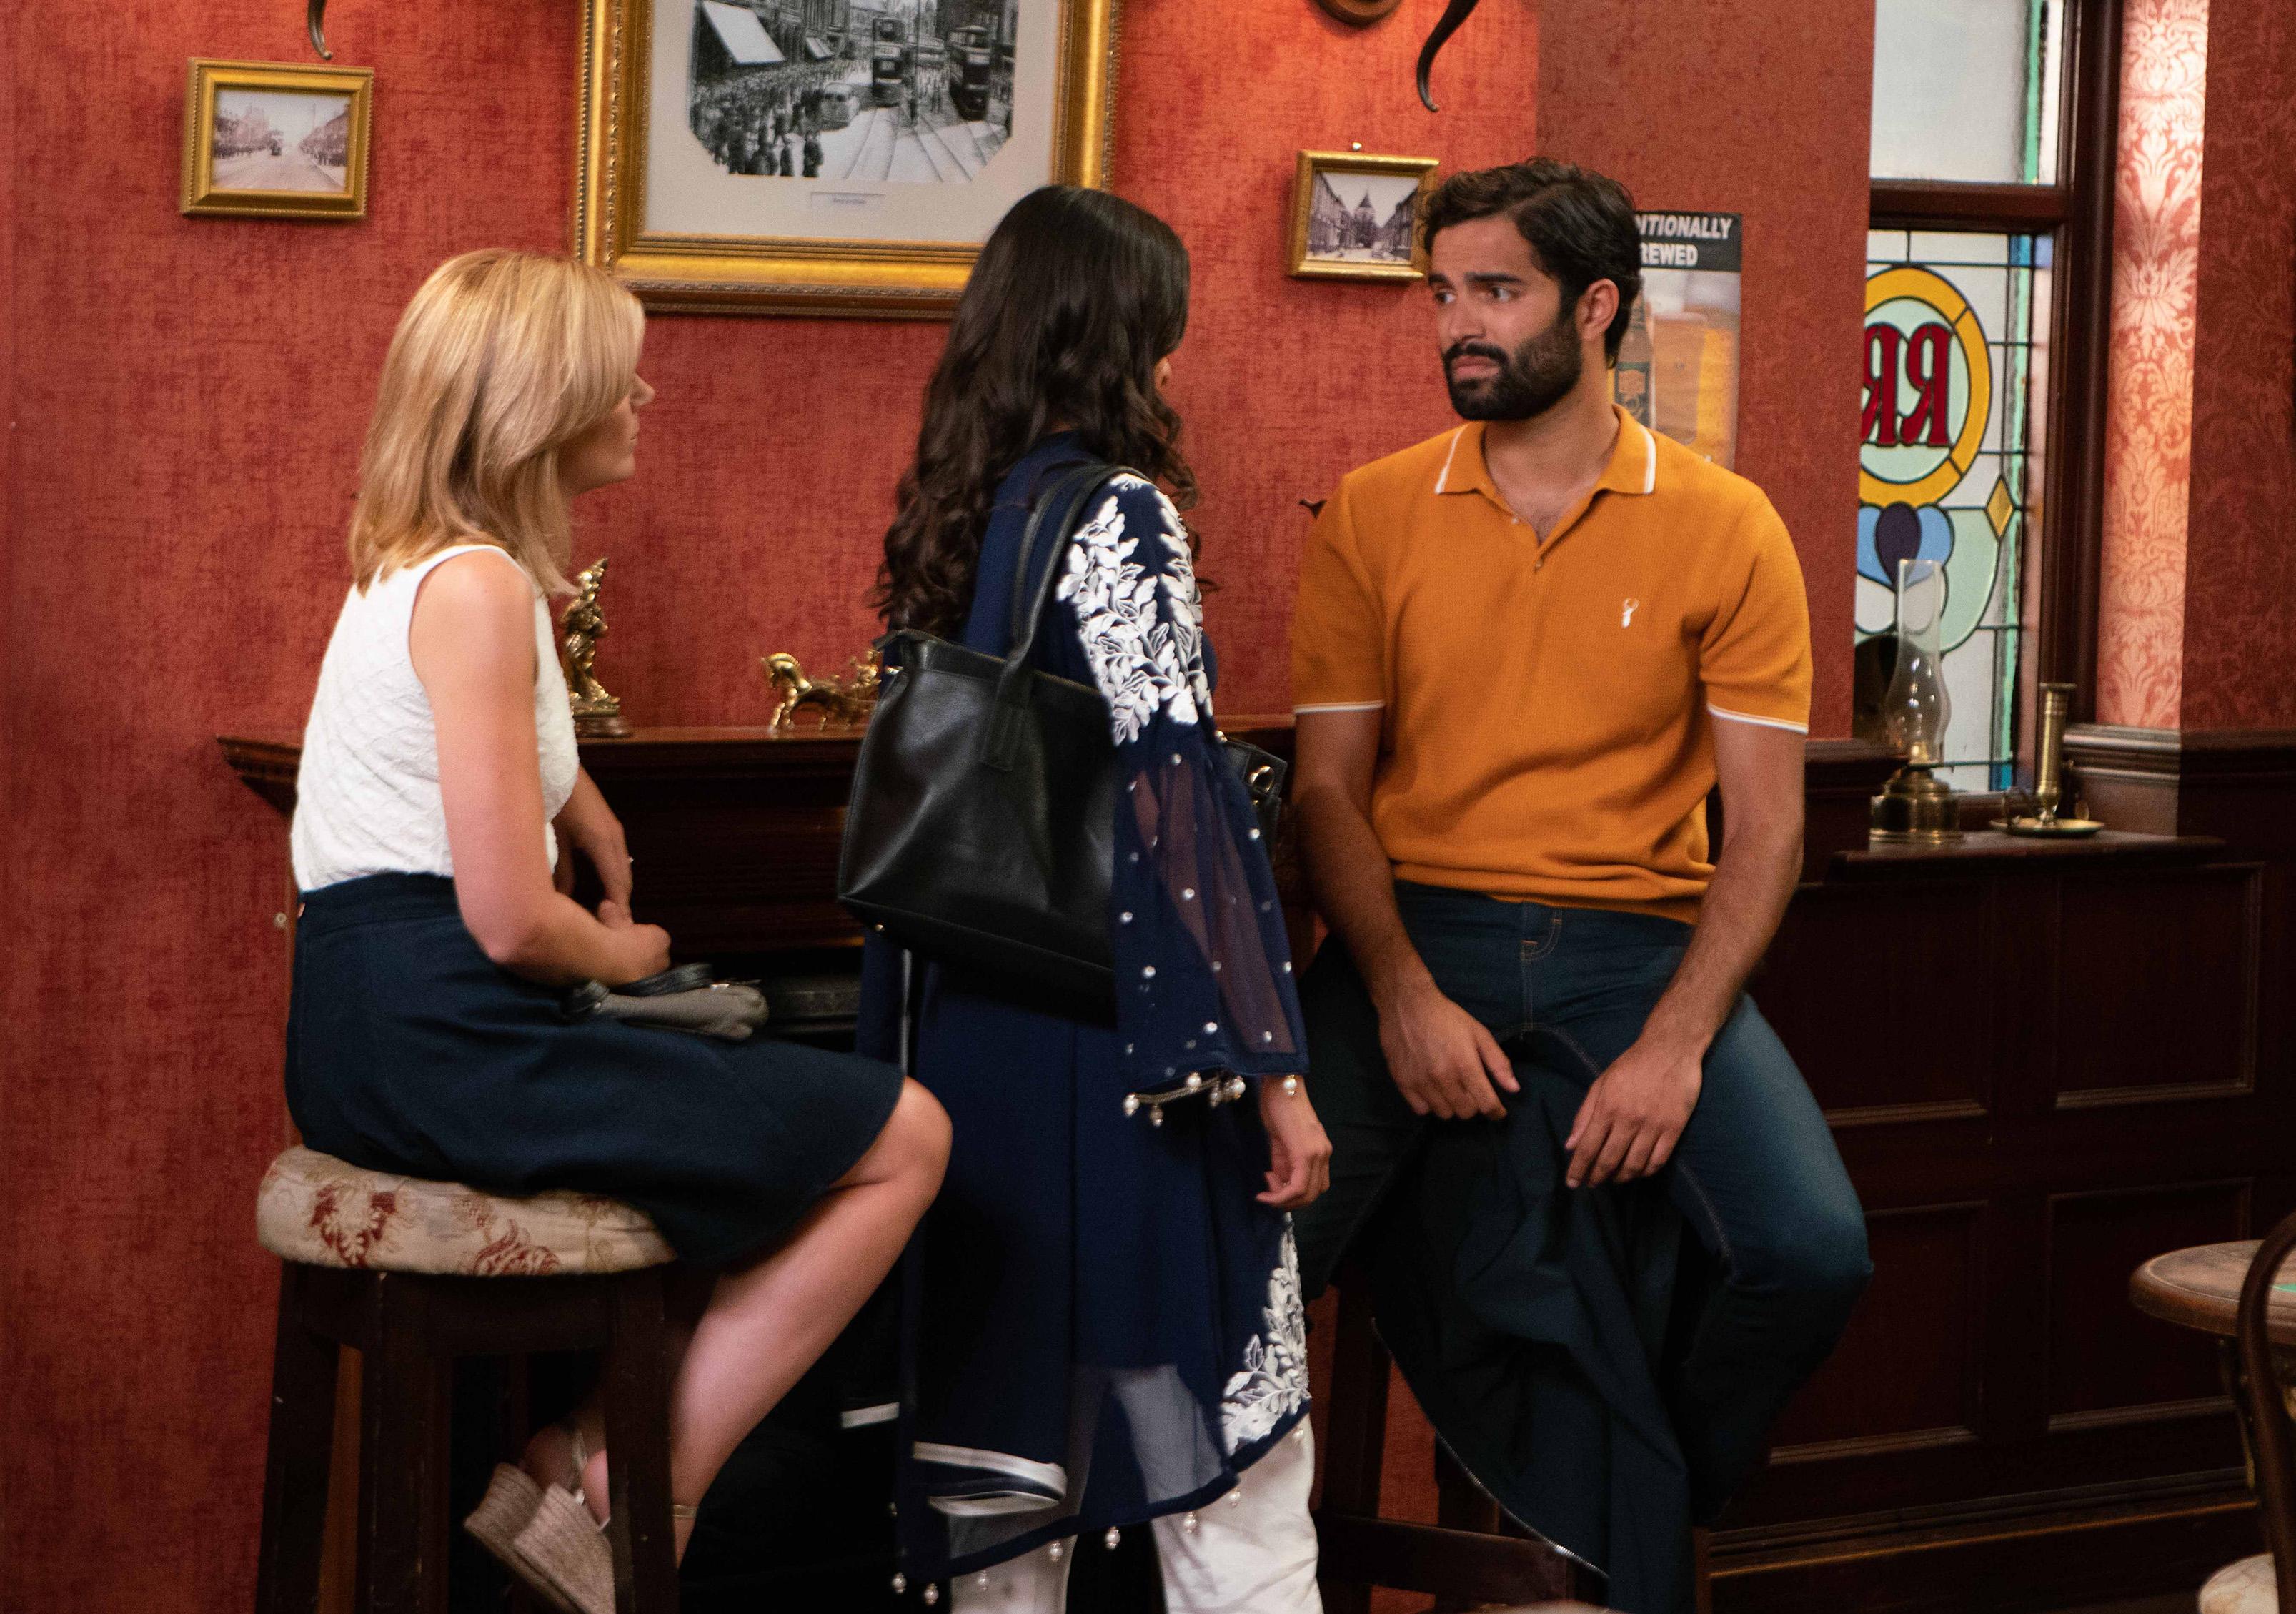 Corrie spoilers: Imran Habeeb rejects Leanne Battersby